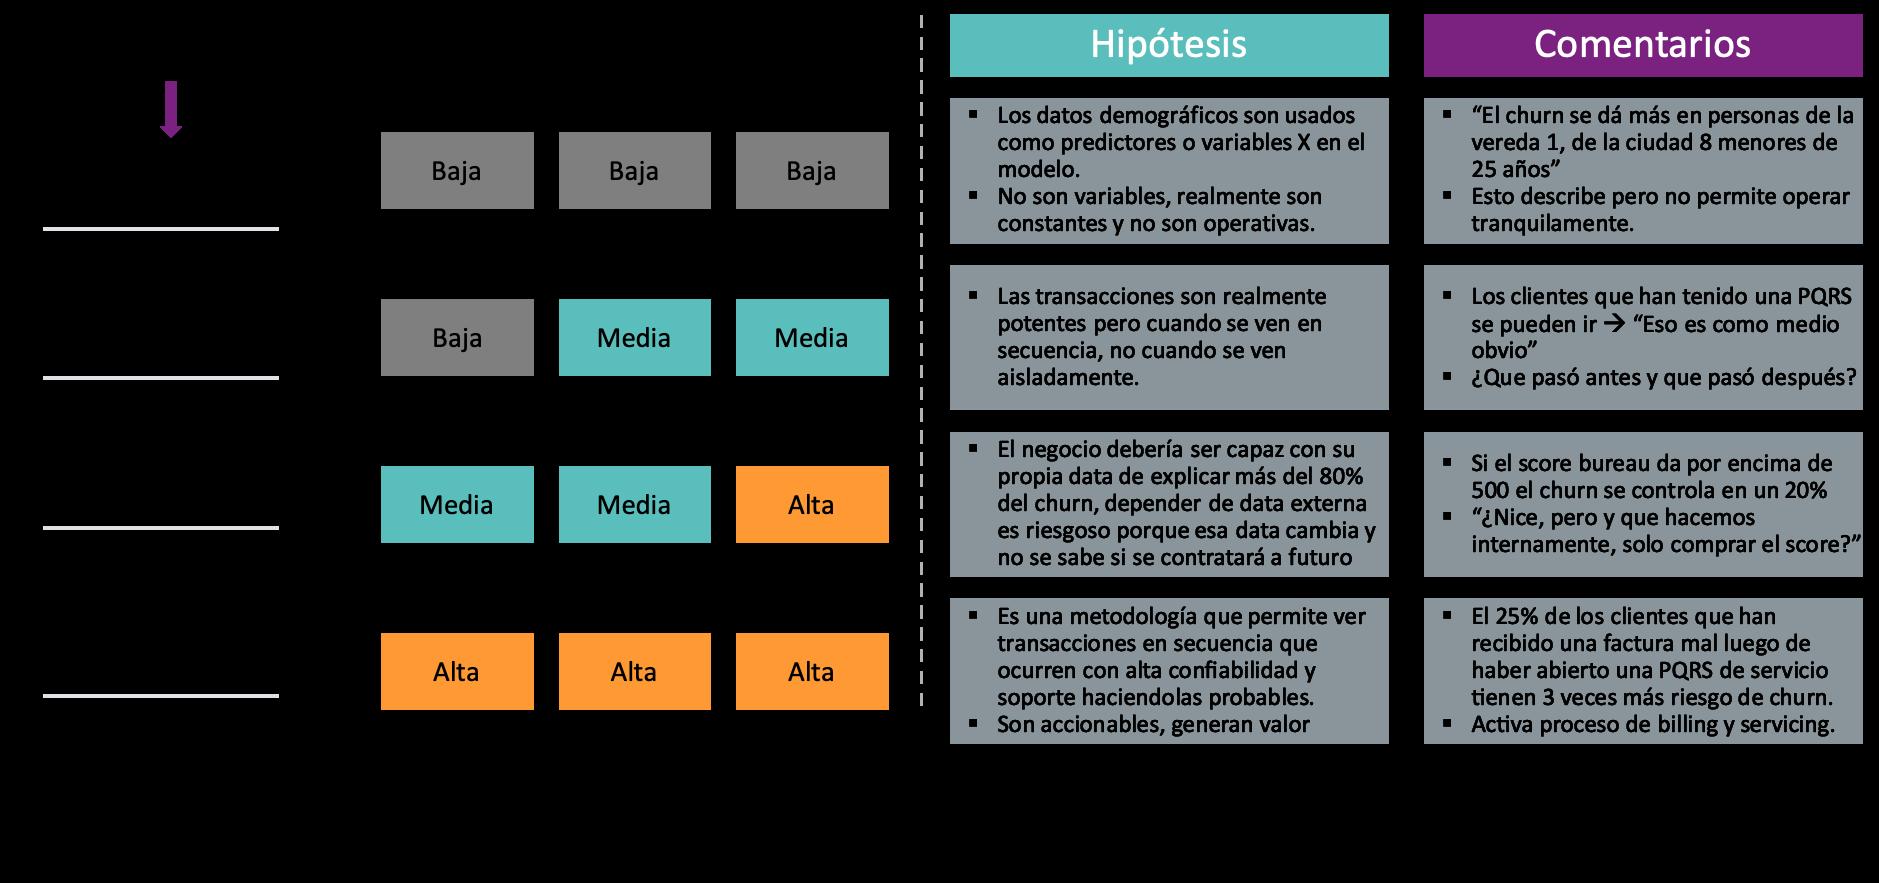 Fuentes_Datos_Churn_SINNETIC